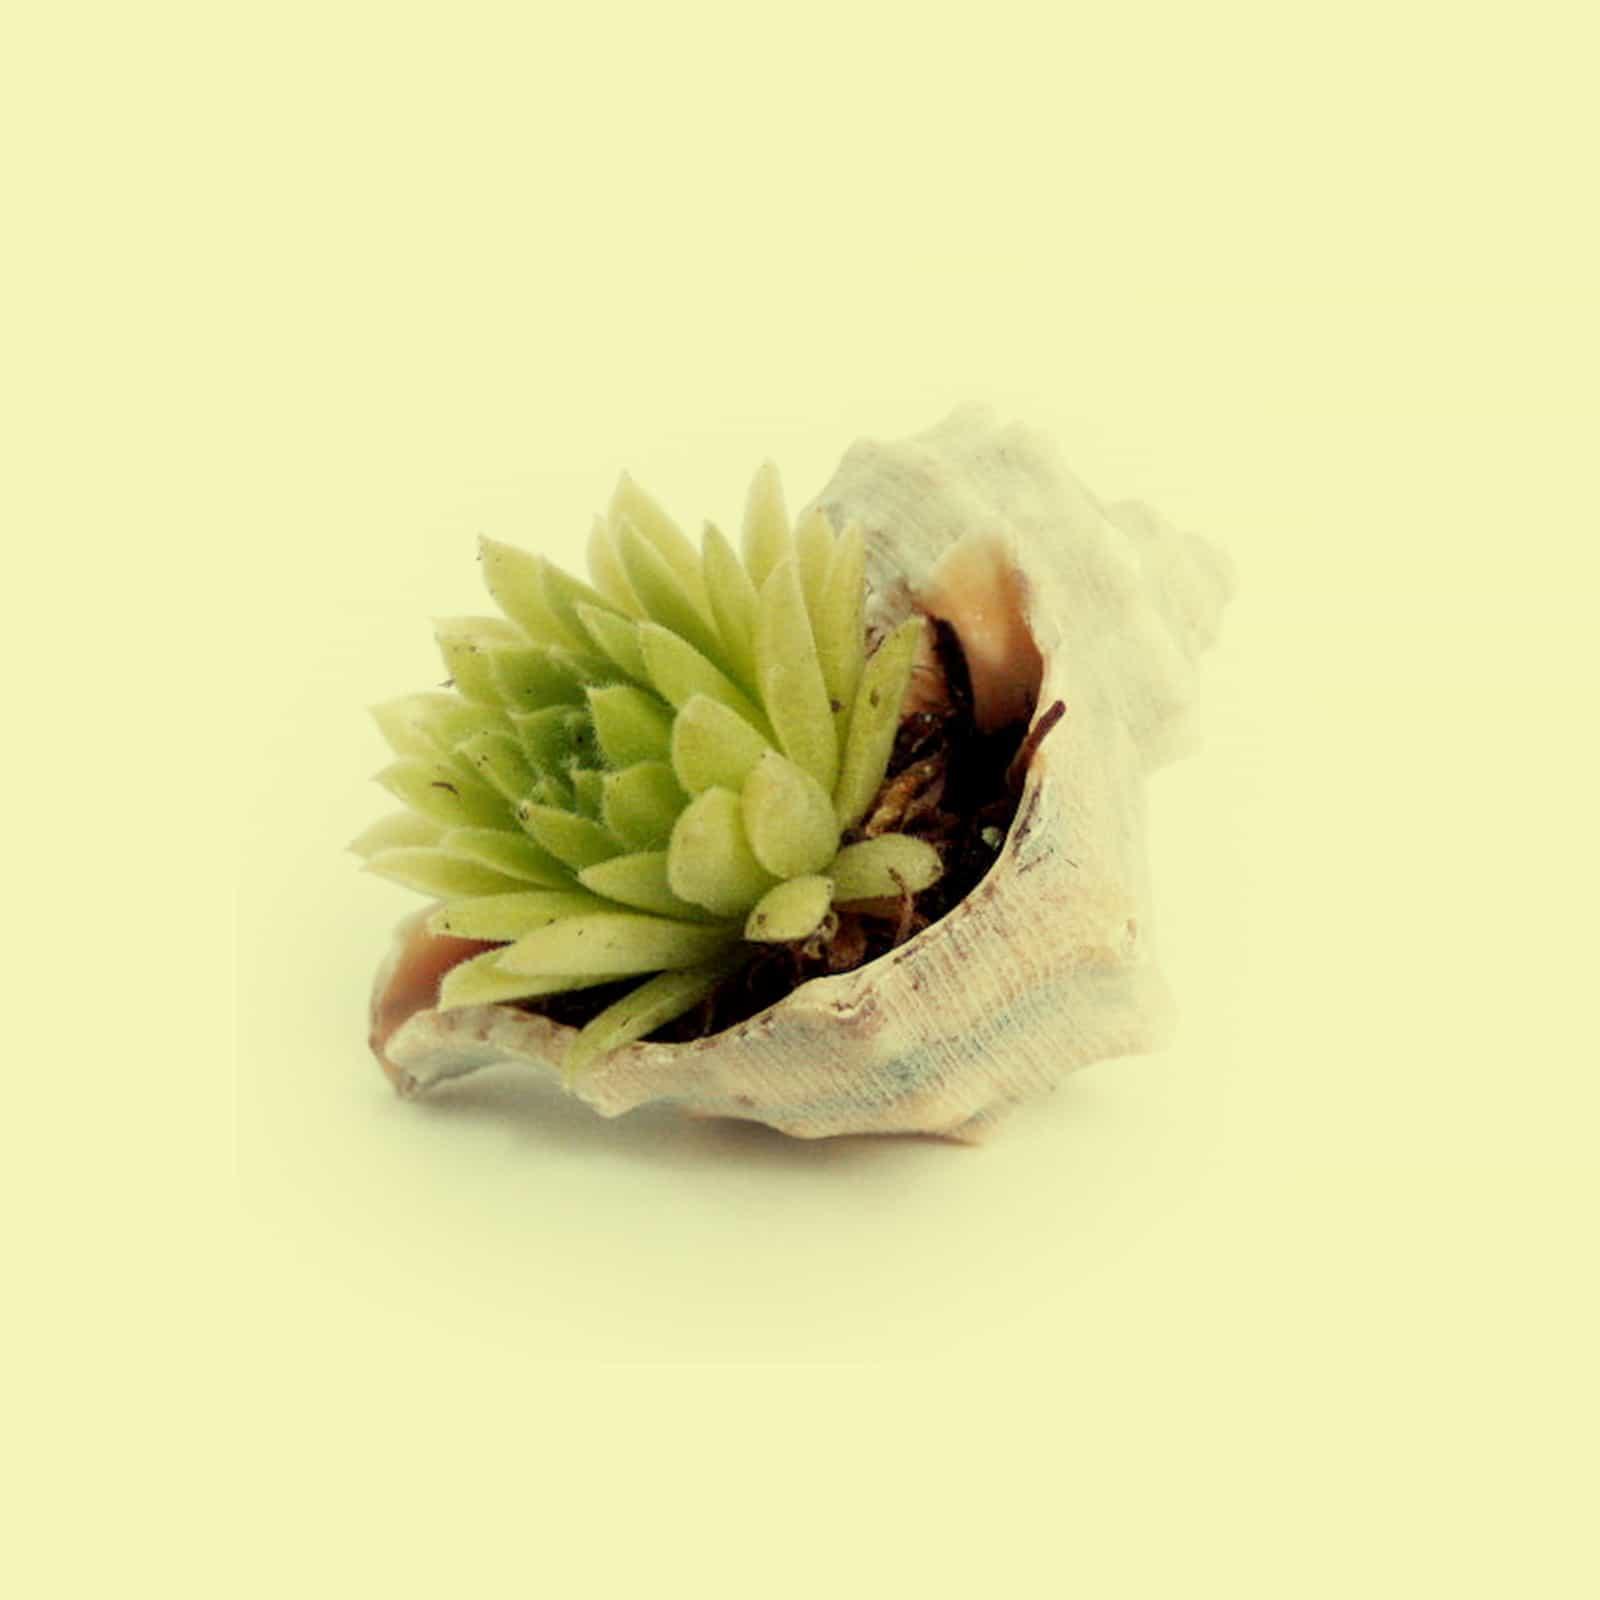 diango_hernandez_seashell-1.jpg